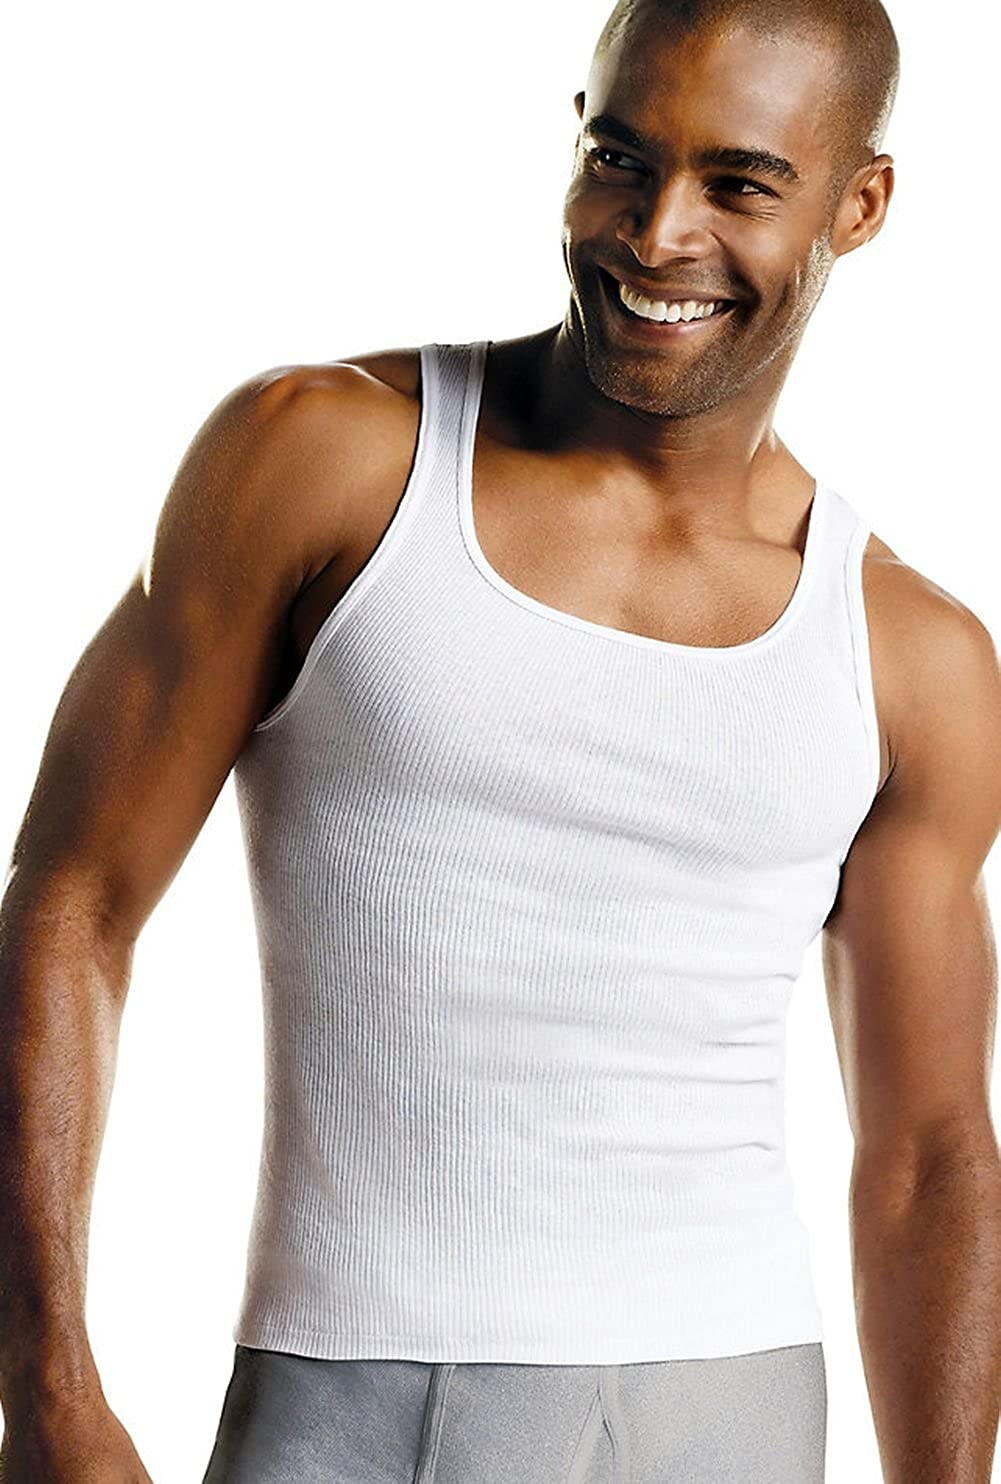 Hanes Men/'s TAGLESS ComfortSoft A-Shirt 7-Pack Includes 1 Free Bonus A-Shirt